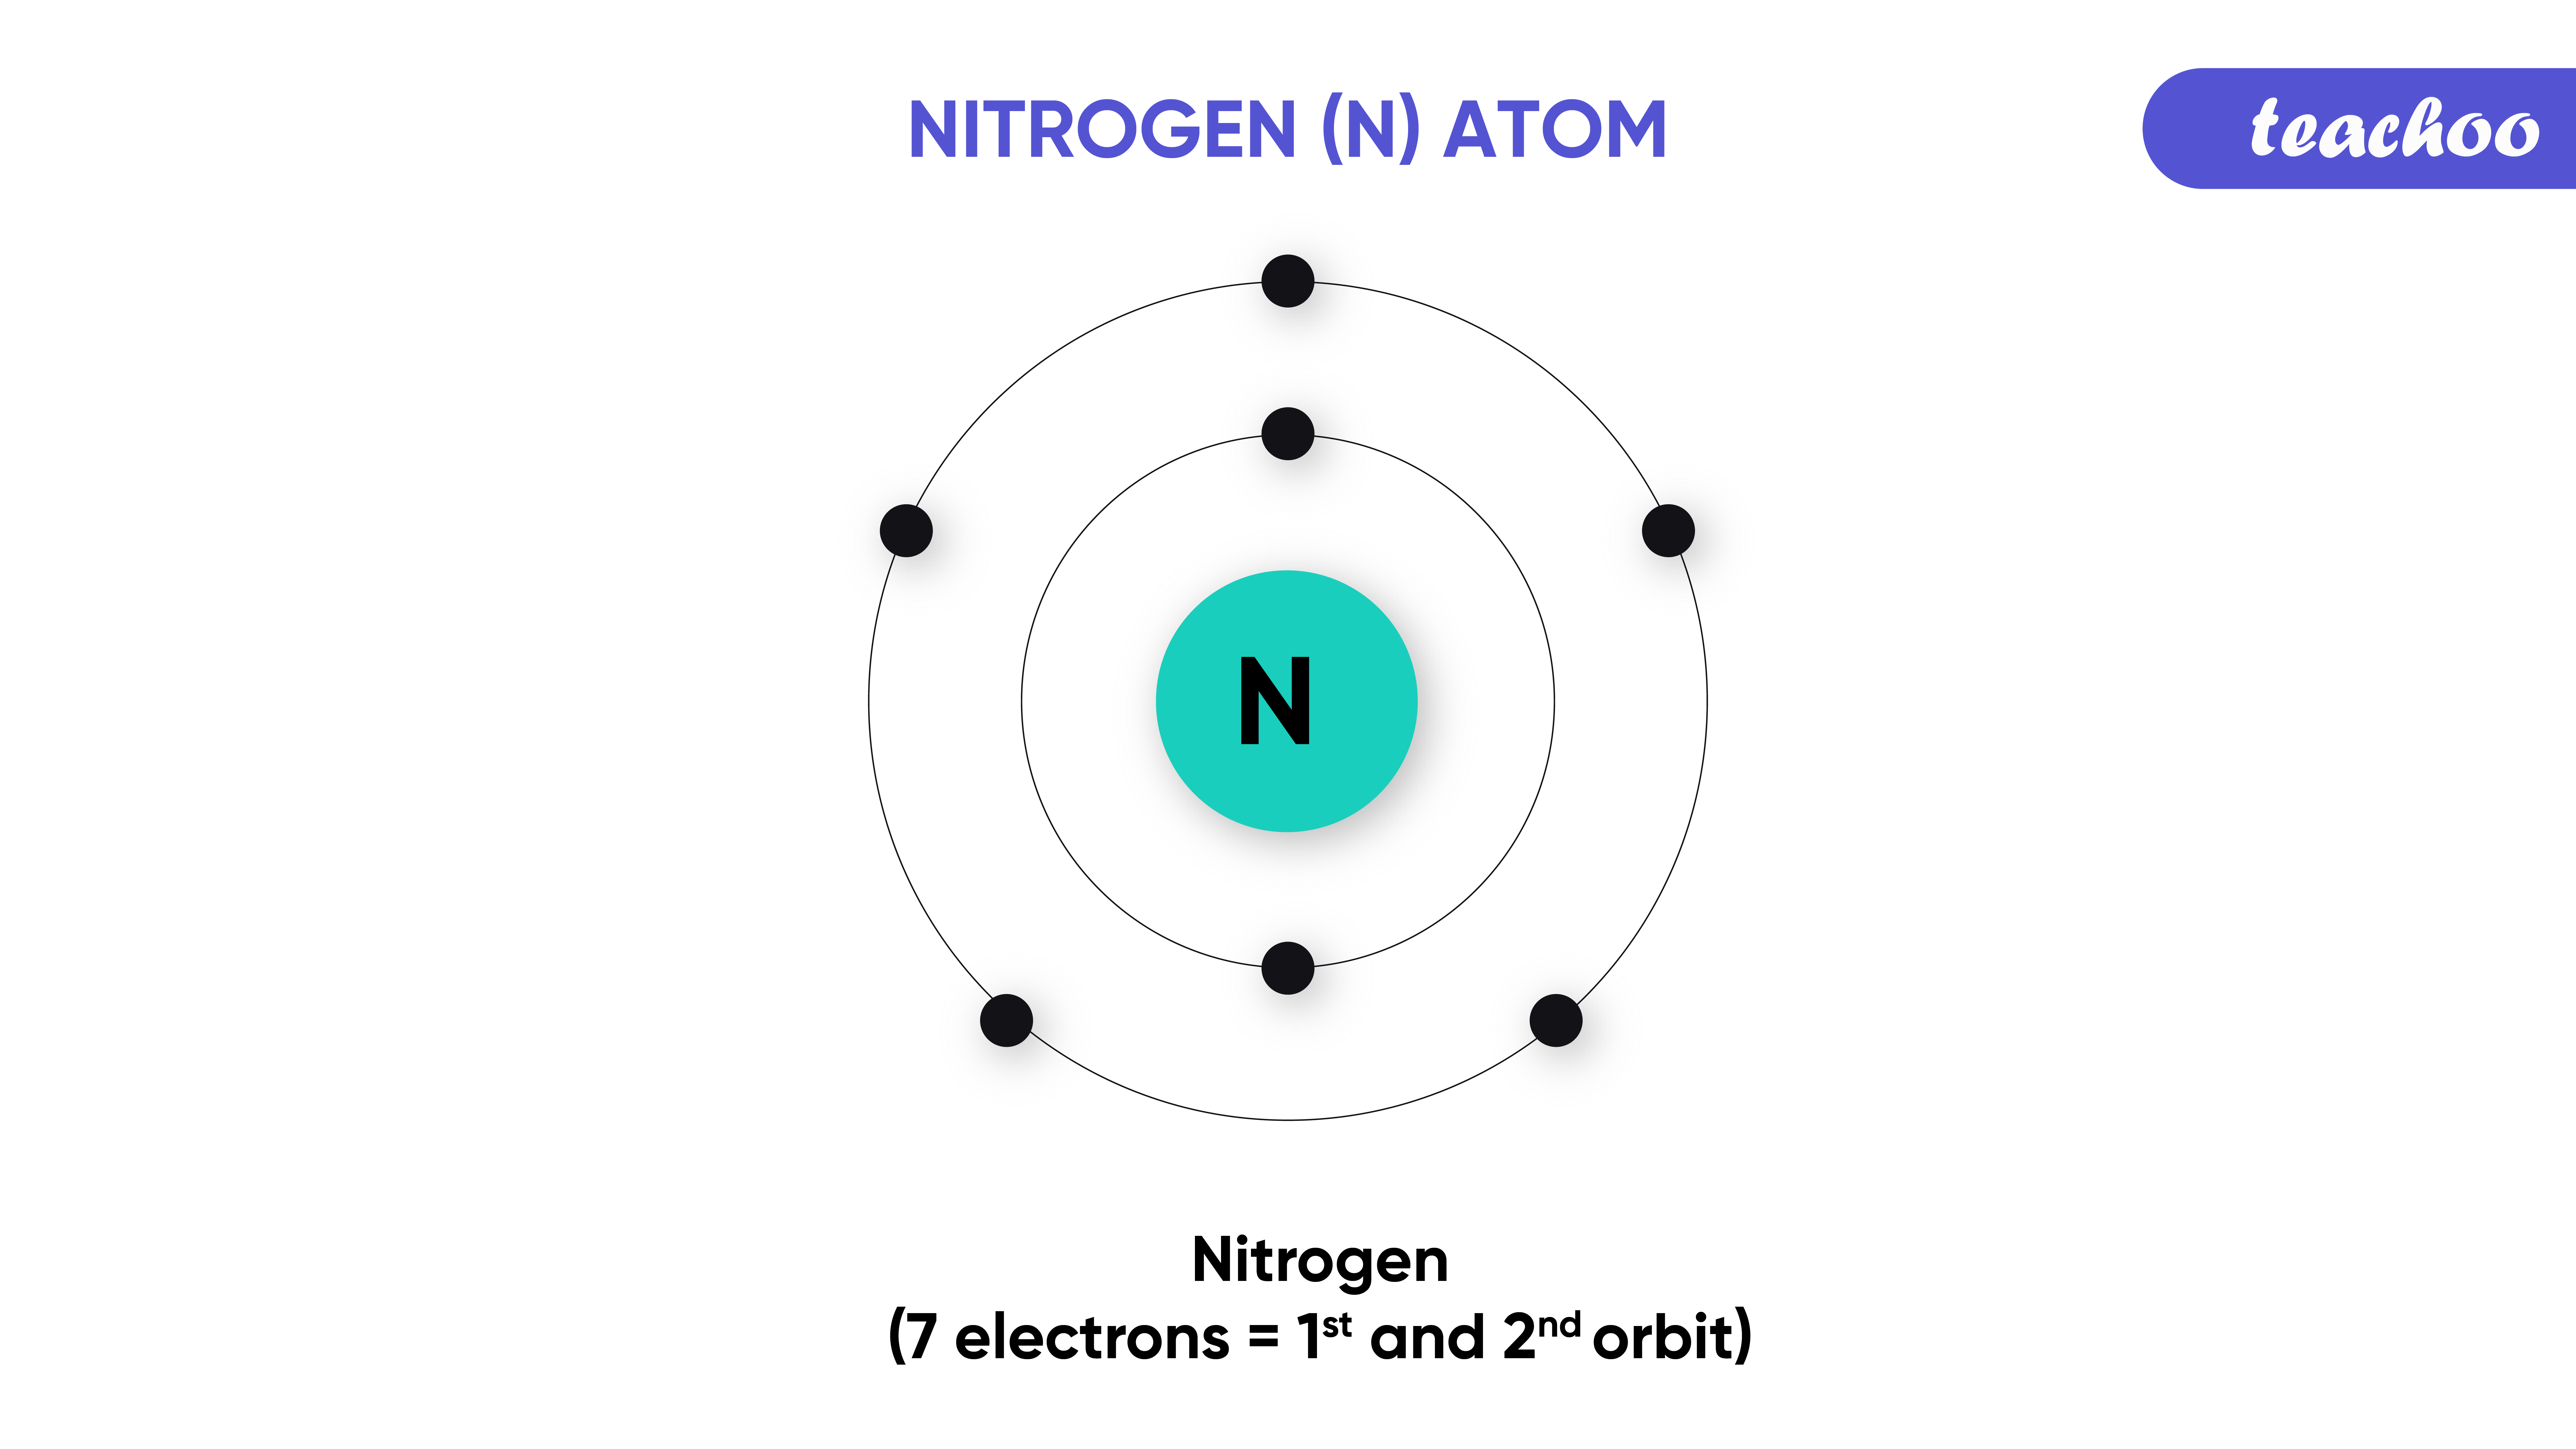 27. nitrogen-Teachoo-01.png